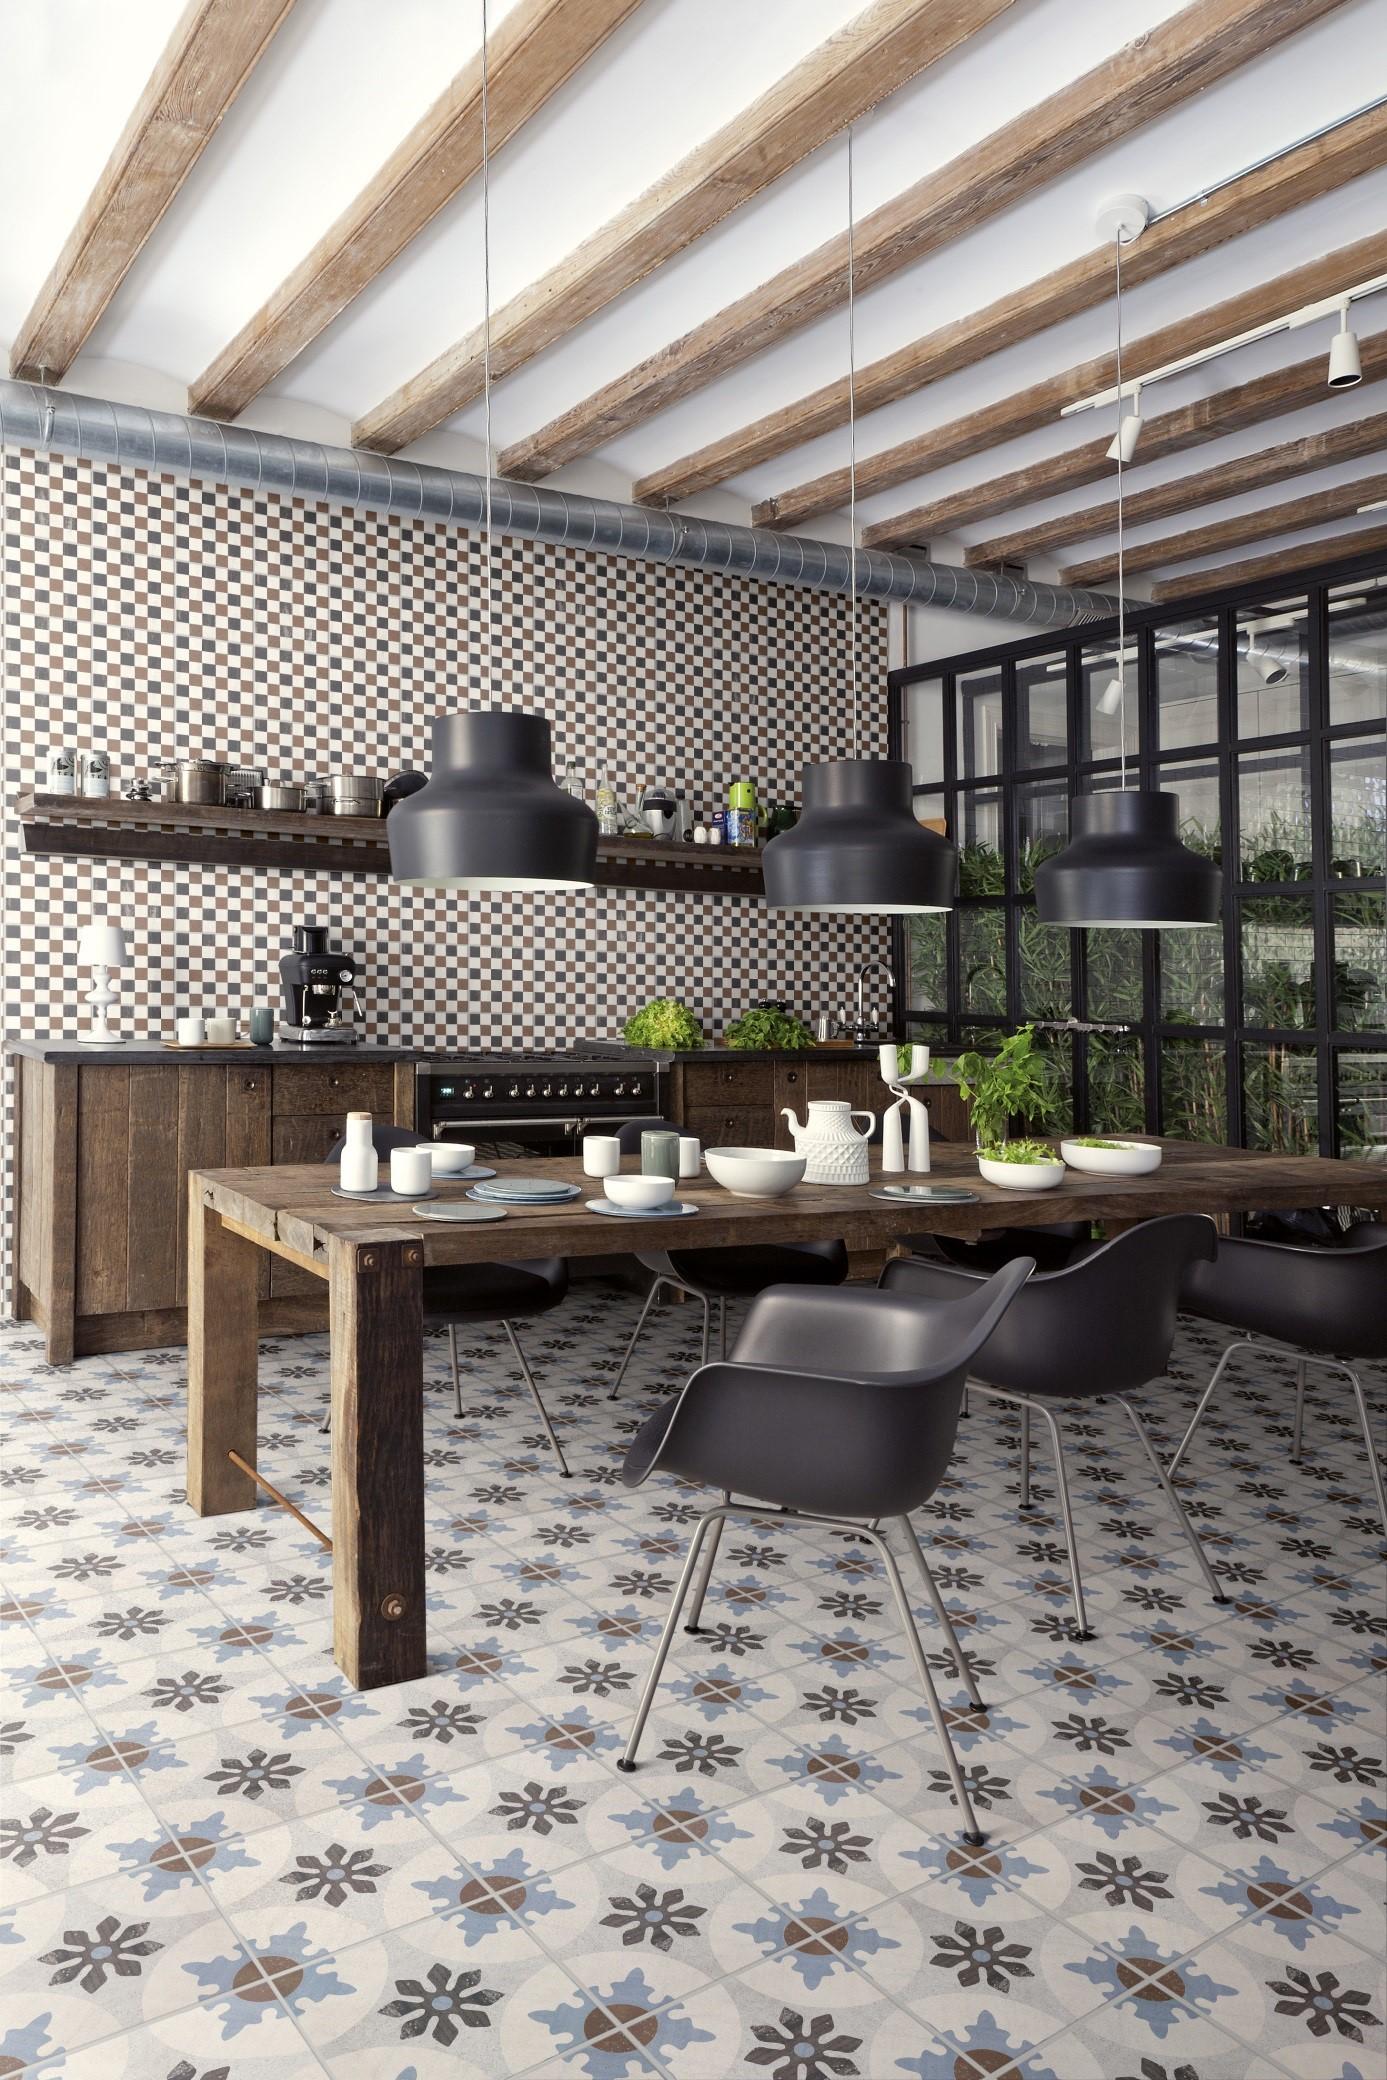 keuken tegels leiden : Koop Keukentegels Vlek En Waterbestendige Keukentegels Door